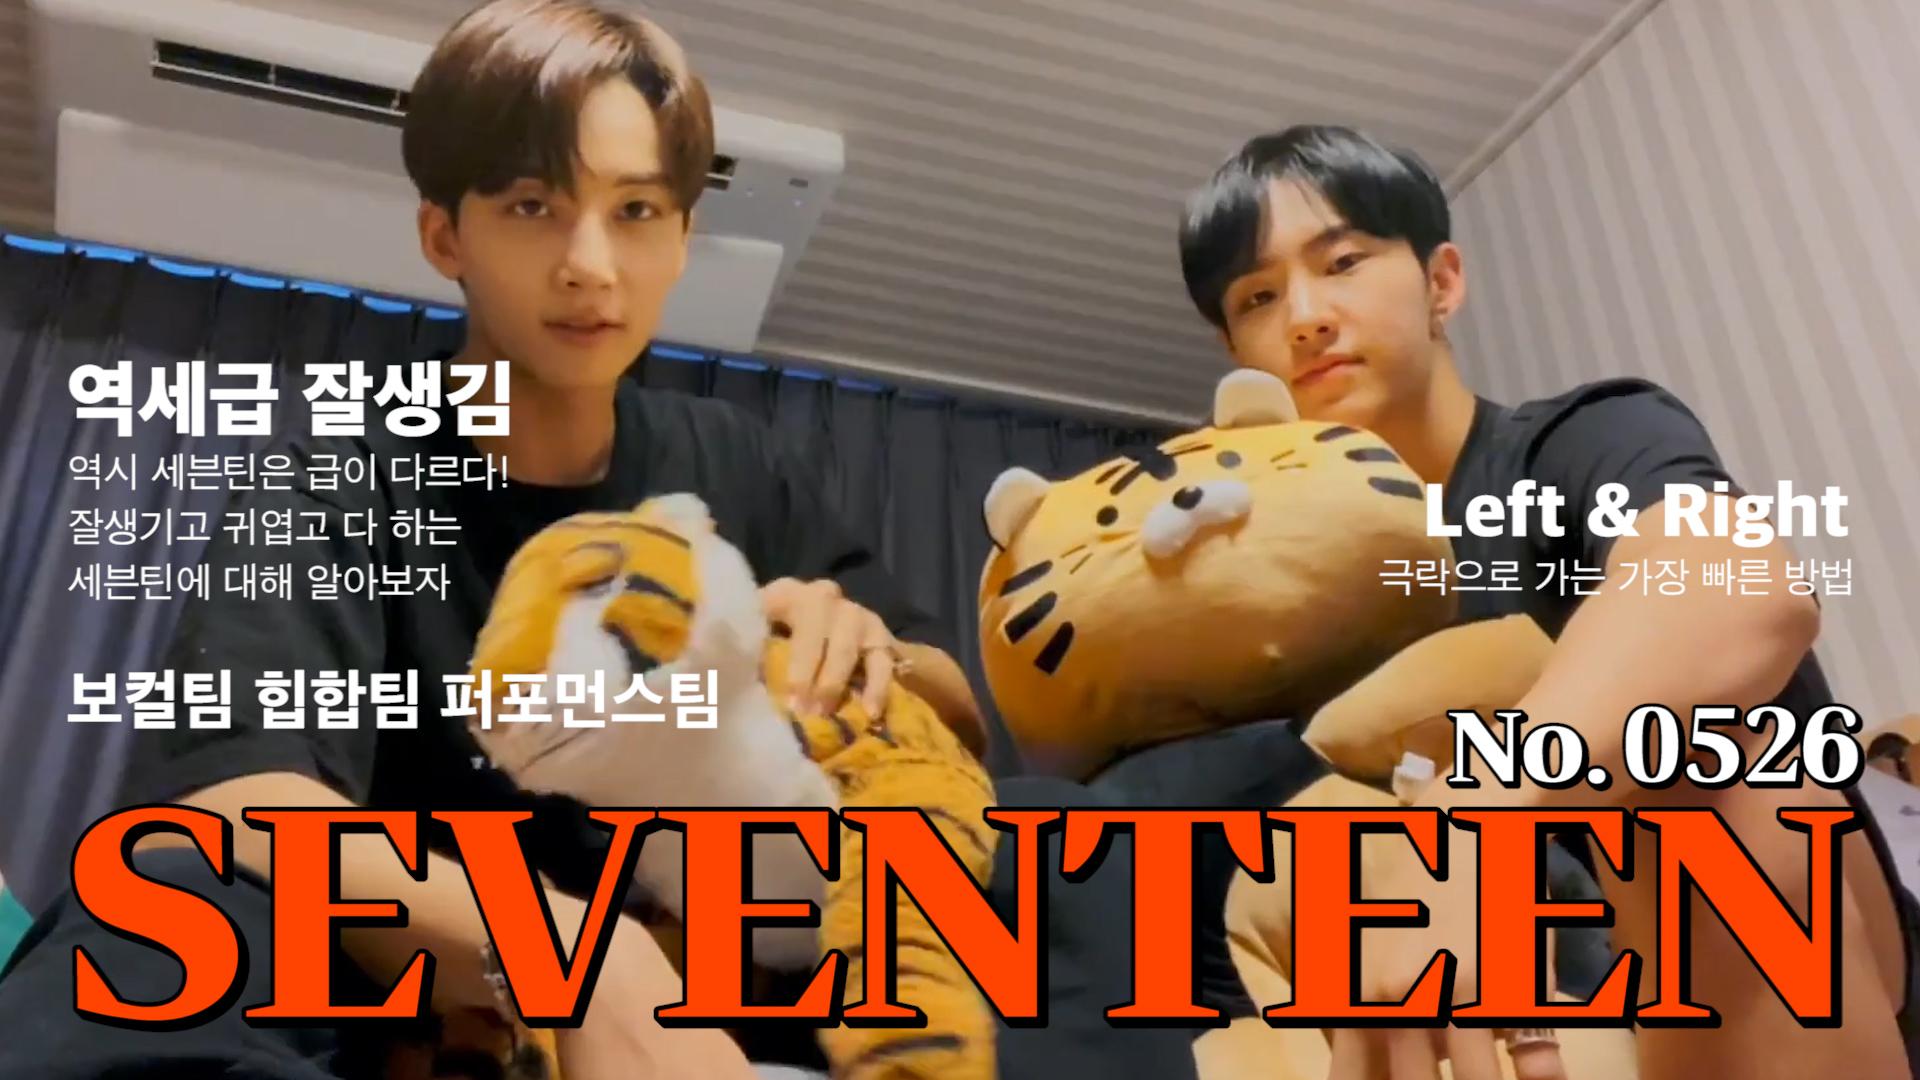 [SEVENTEEN] 쫑쫑이와 깽깽이의 🐰모여봐요 호랑이의 방🐯 (Jeonghan&Hoshi showing Hoshi's tiger dolls)